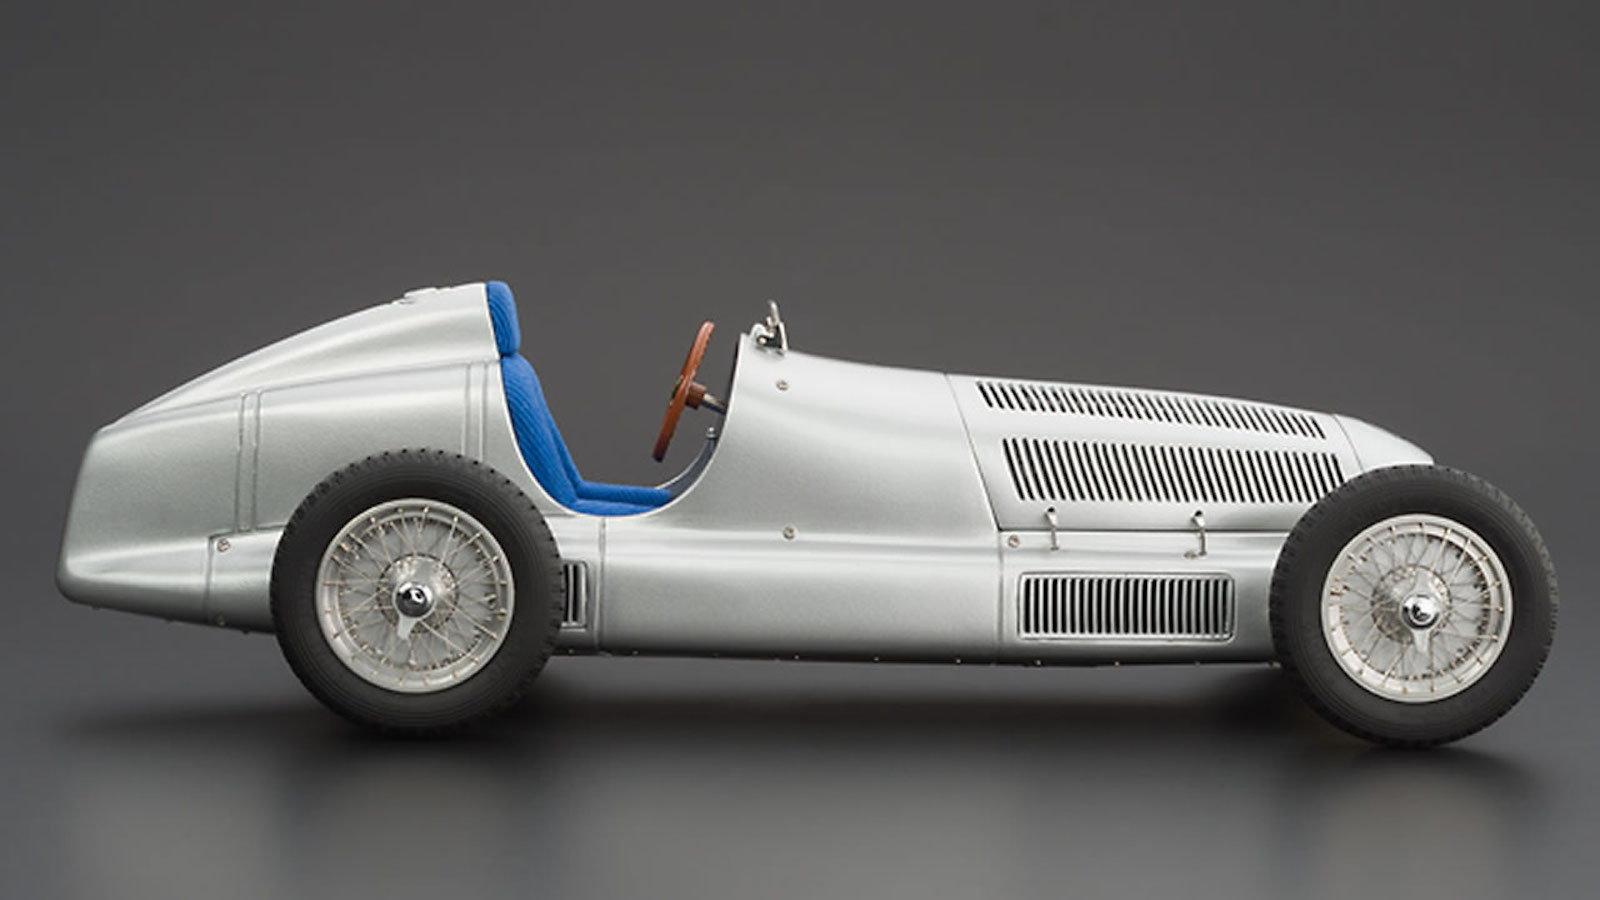 Mercedes-Benz W25 Silver Arrow